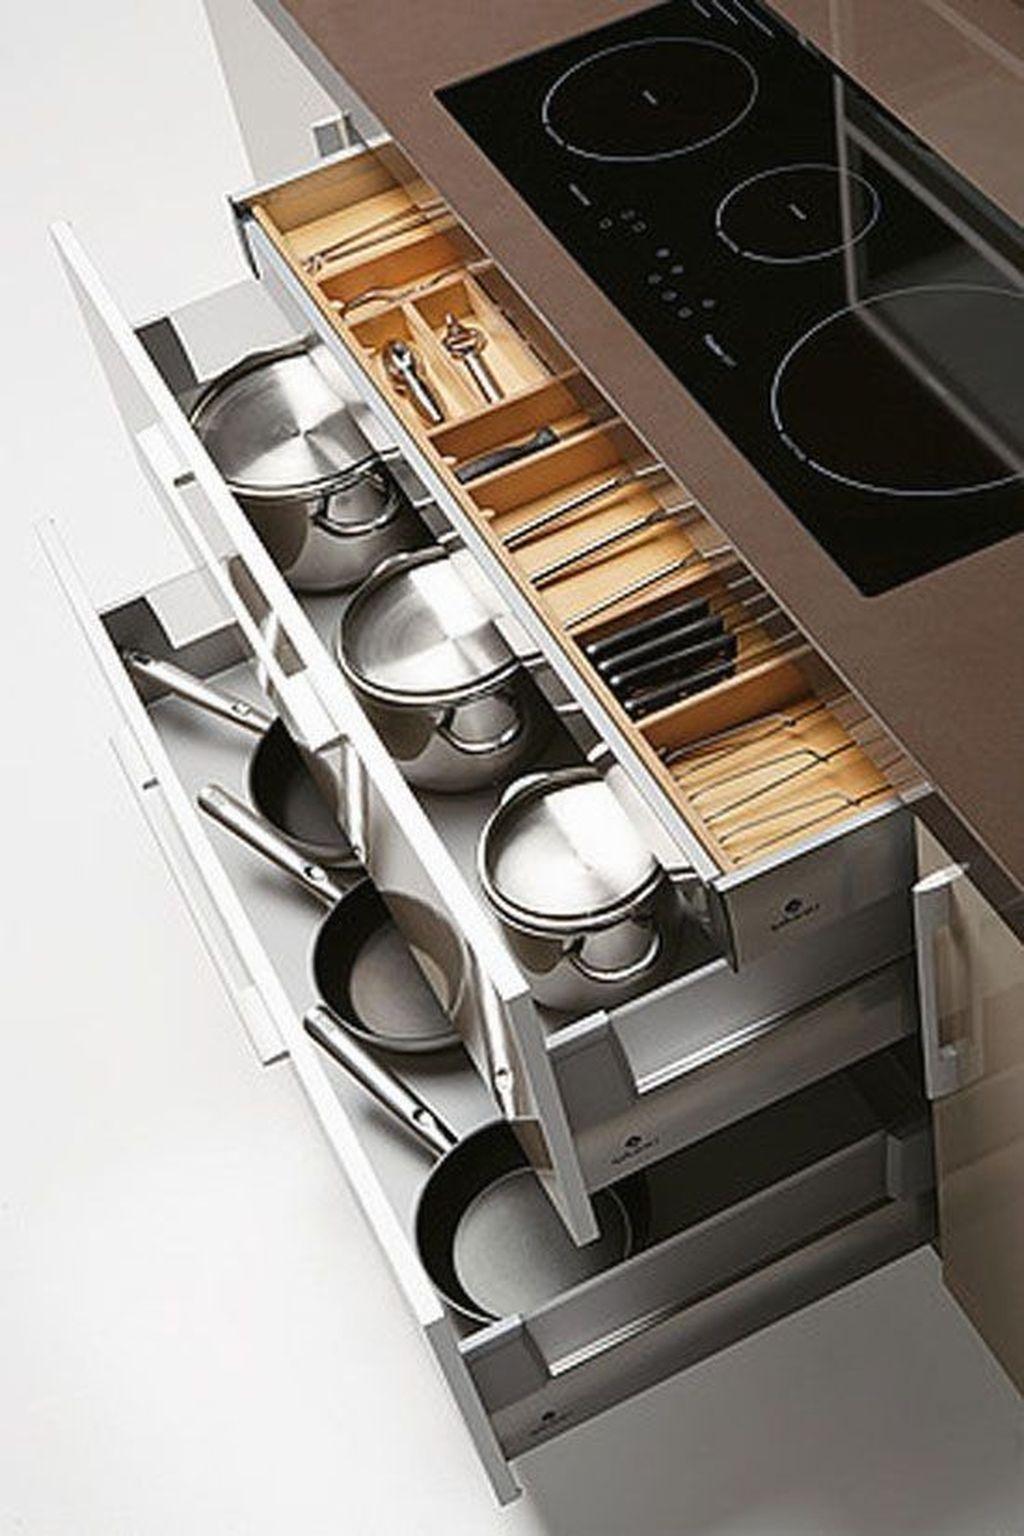 Pin By Mamarina Karman On Kitchen Clever Kitchen Storage Kitchen Storage Solutions Kitchen Storage